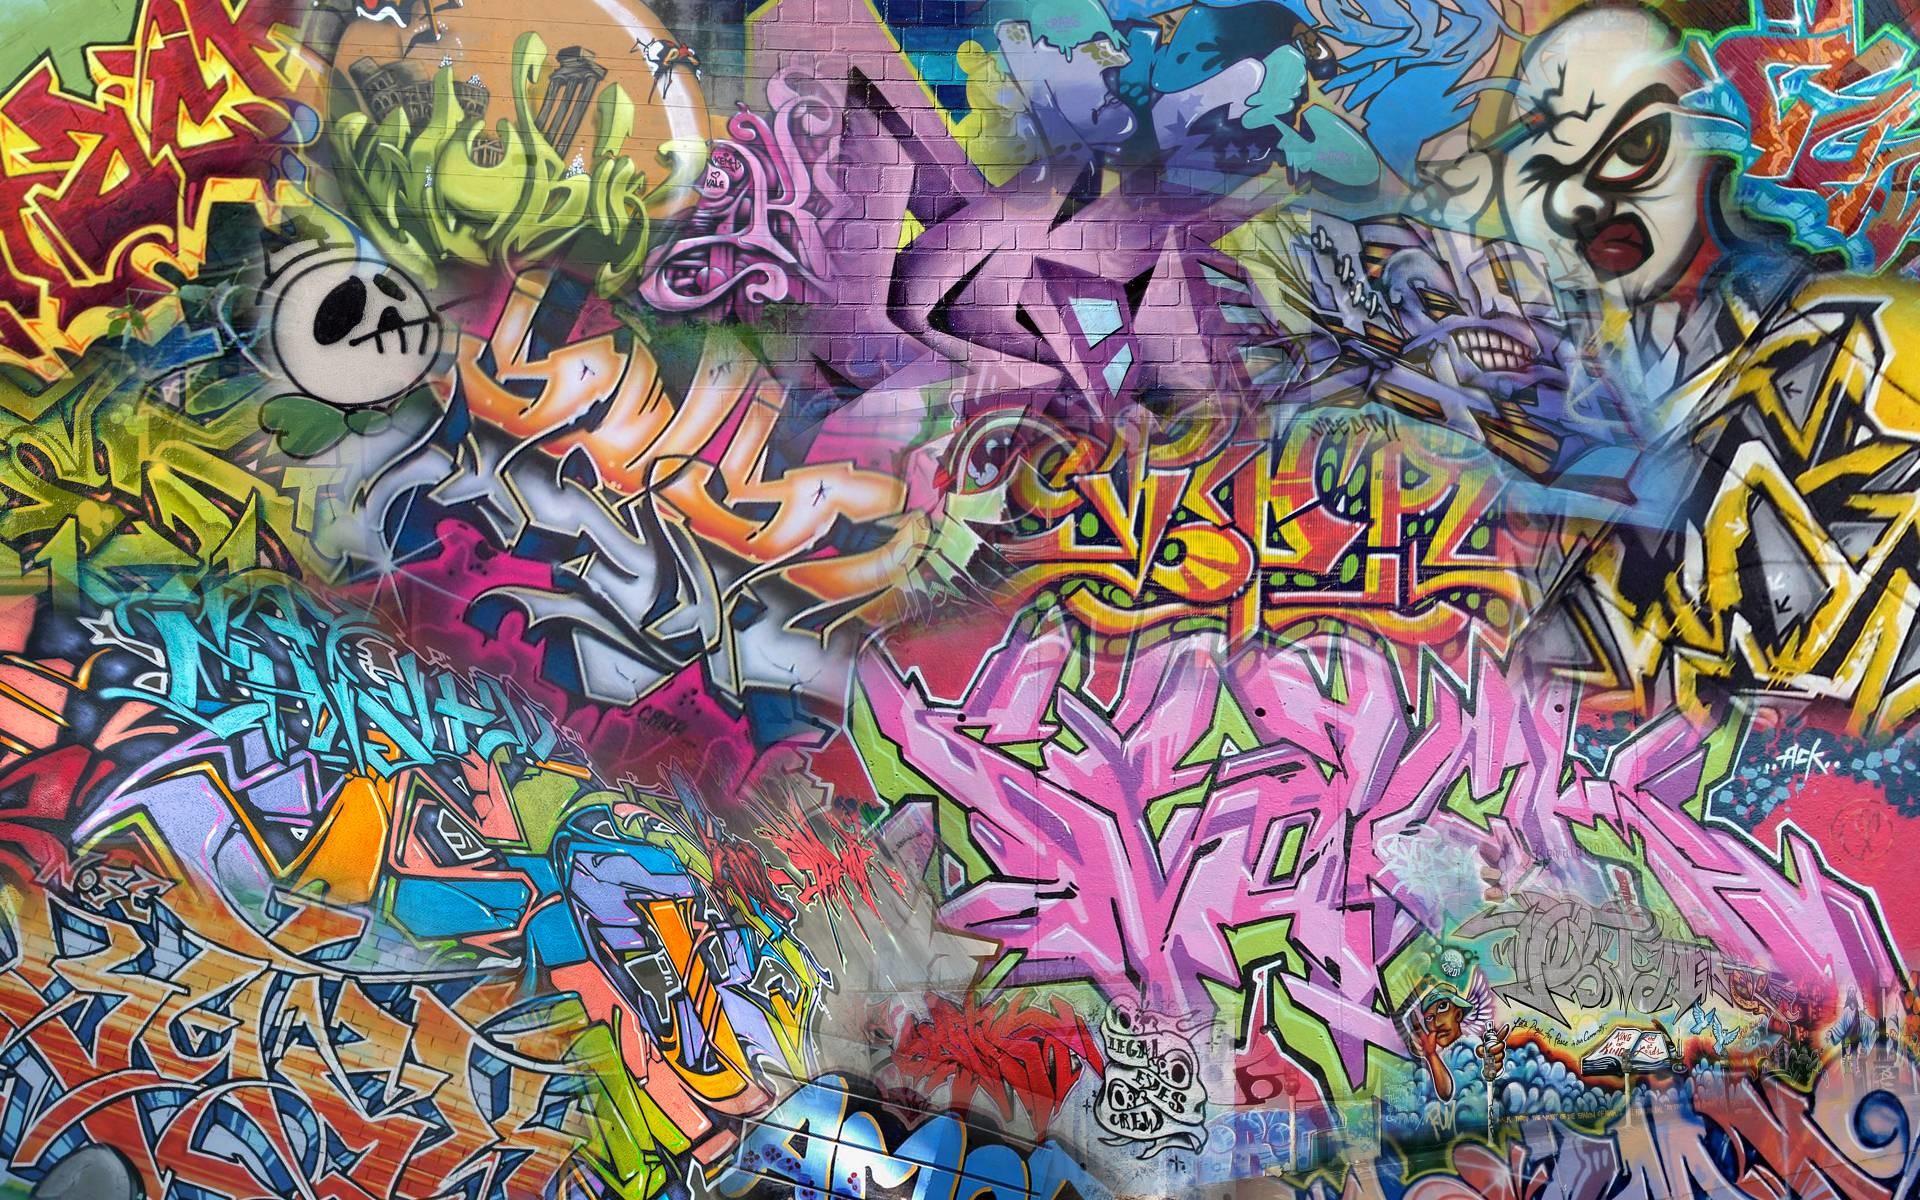 Cool Street Art Abstract Wallpaper Picture #703 Wallpaper | High .